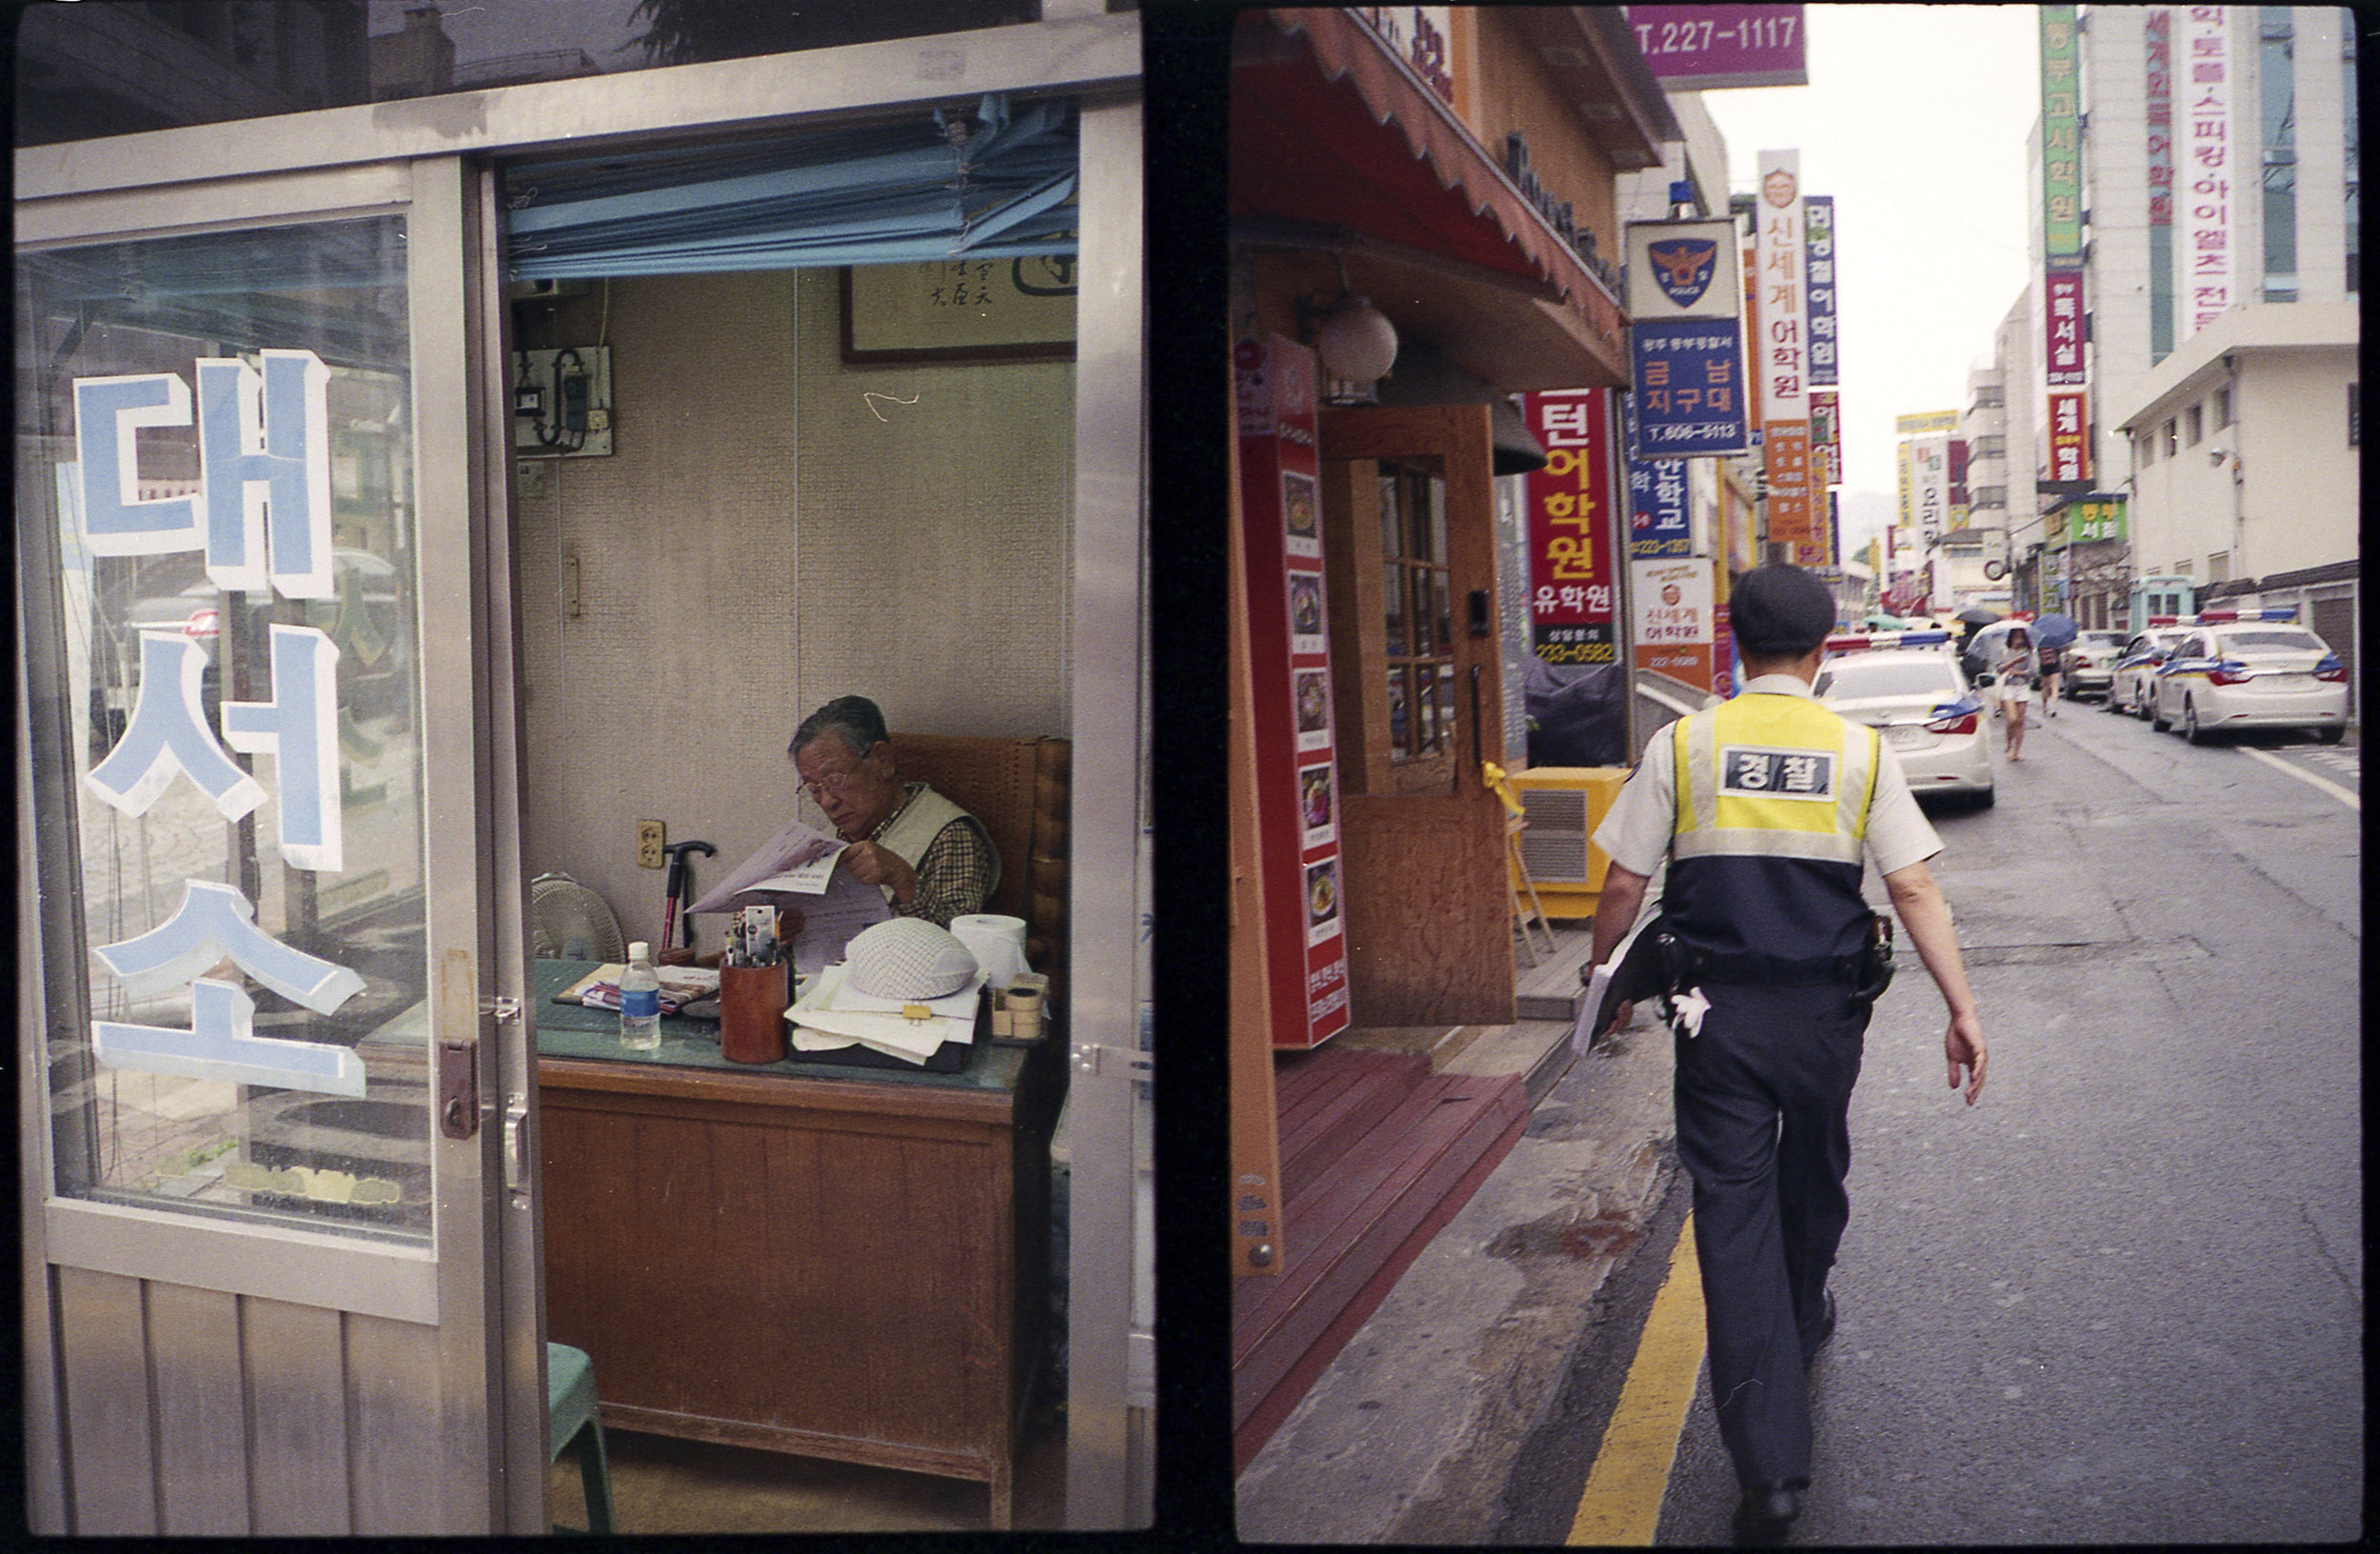 Desk Man and Police Officer